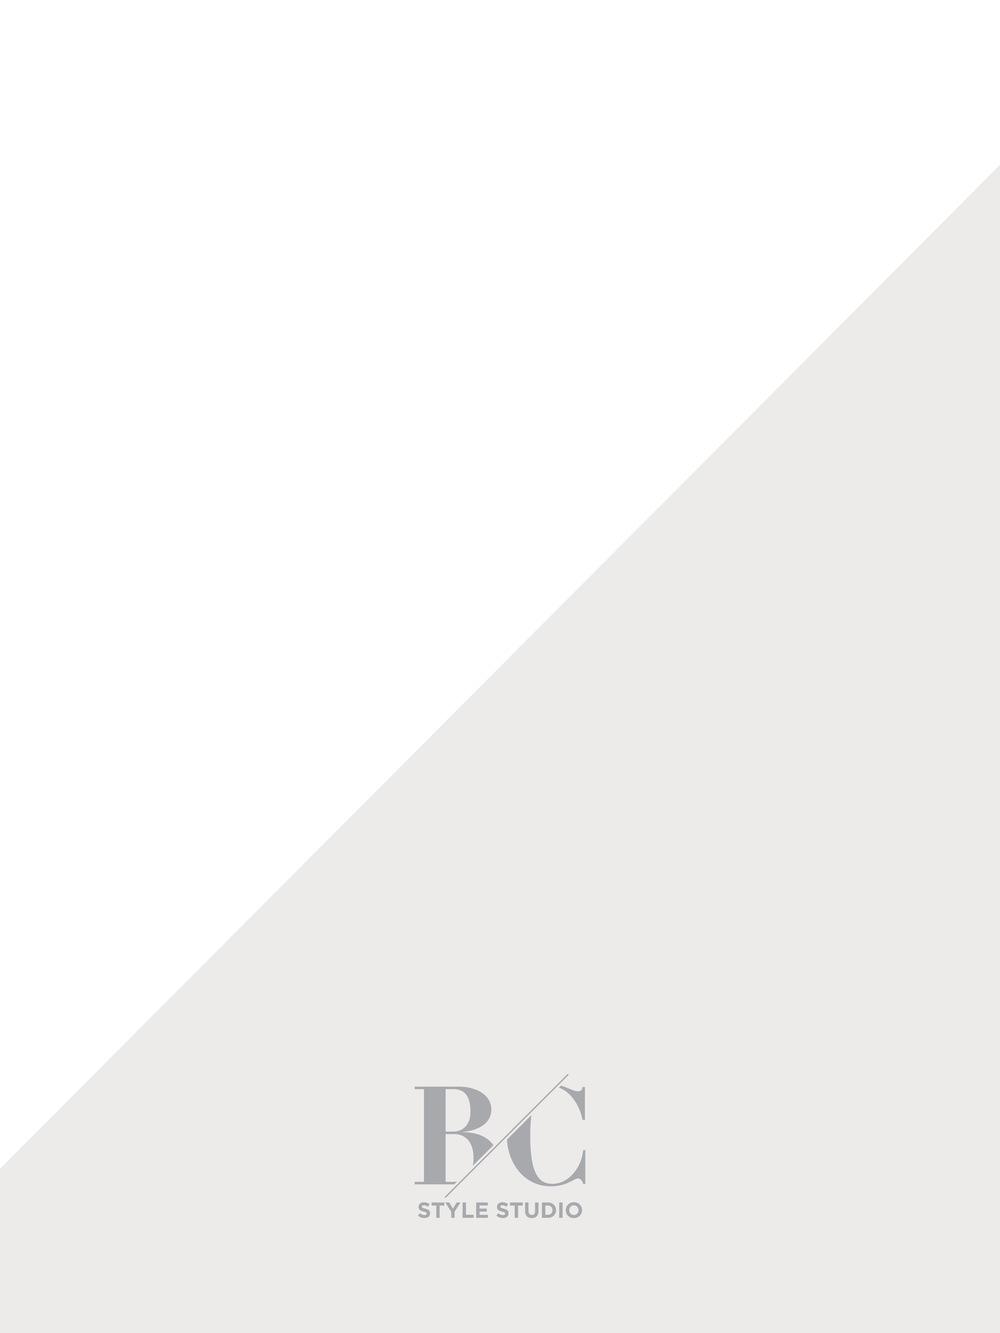 B+C Portfolio 33.jpeg